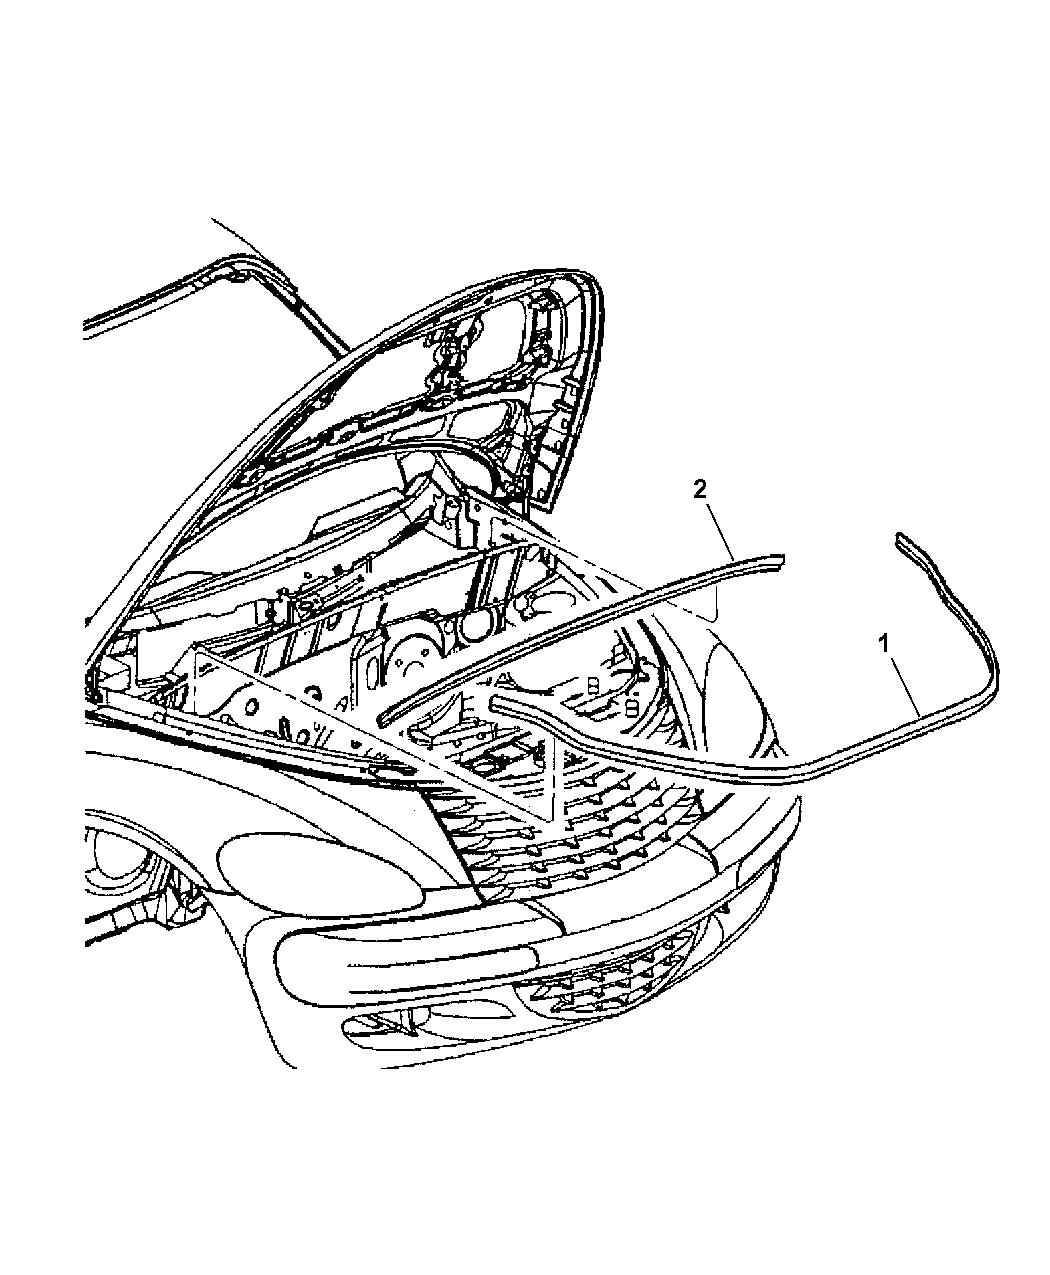 2001 Chrysler PT Cruiser Seals & Weatherstrips, Hood